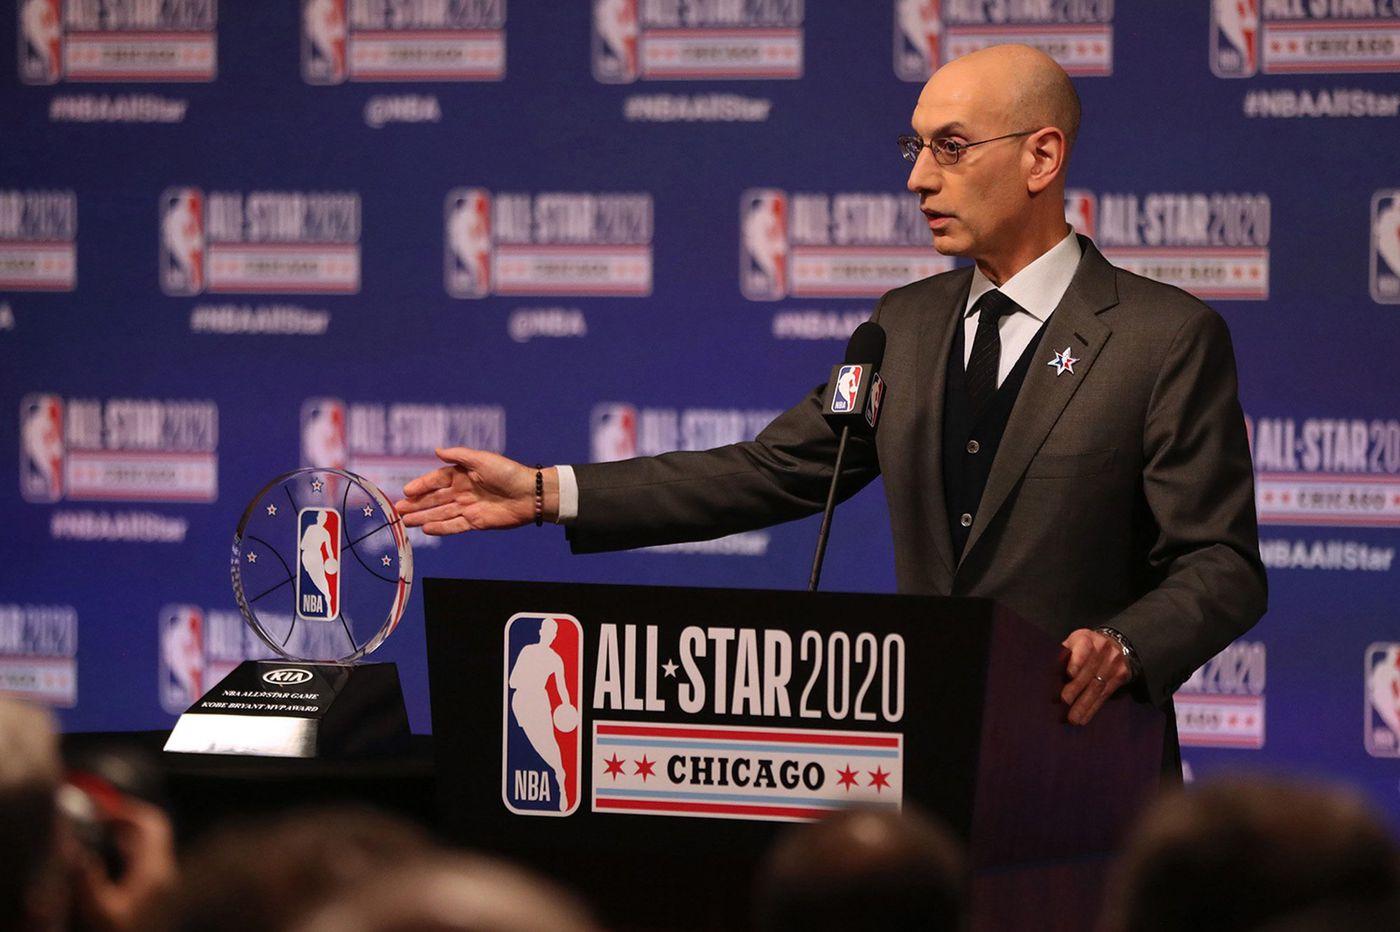 NBA announces structure, format for 2020-21 season